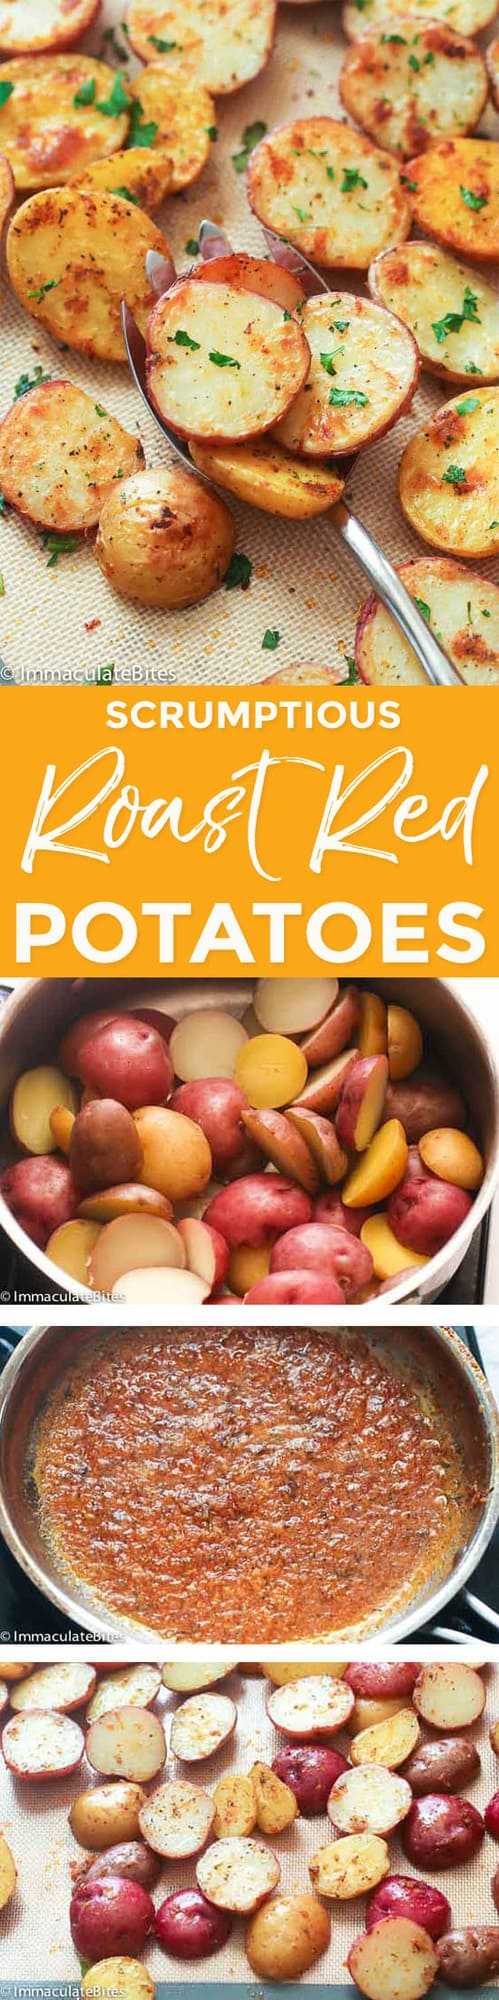 Roast Red Potatoes